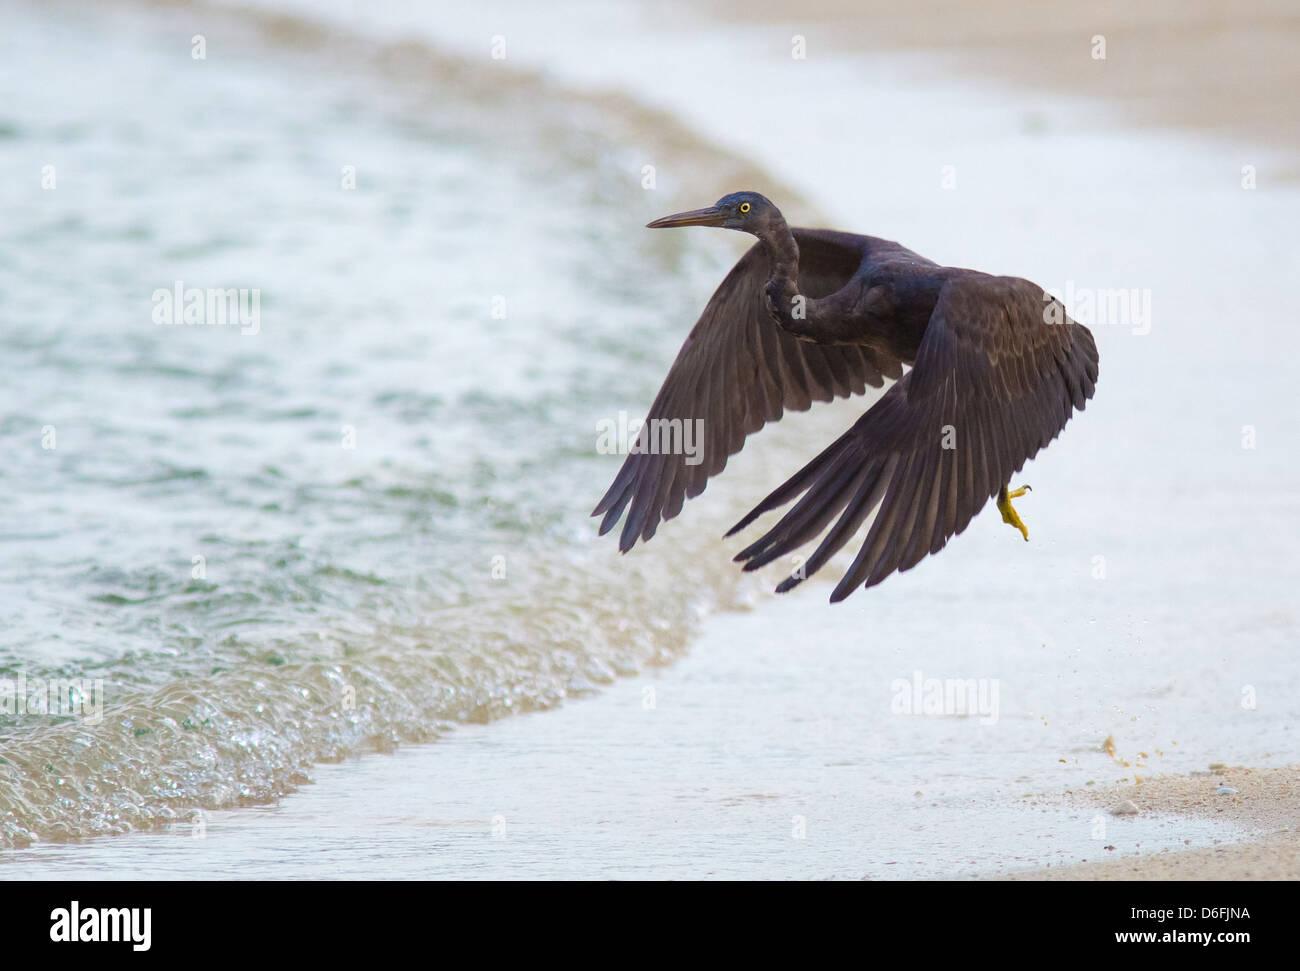 Pacific Reef Egret Egreta sacra ( dark morph ) lifting off from the beach on Selingan Island Marine Park Borneo - Stock Image